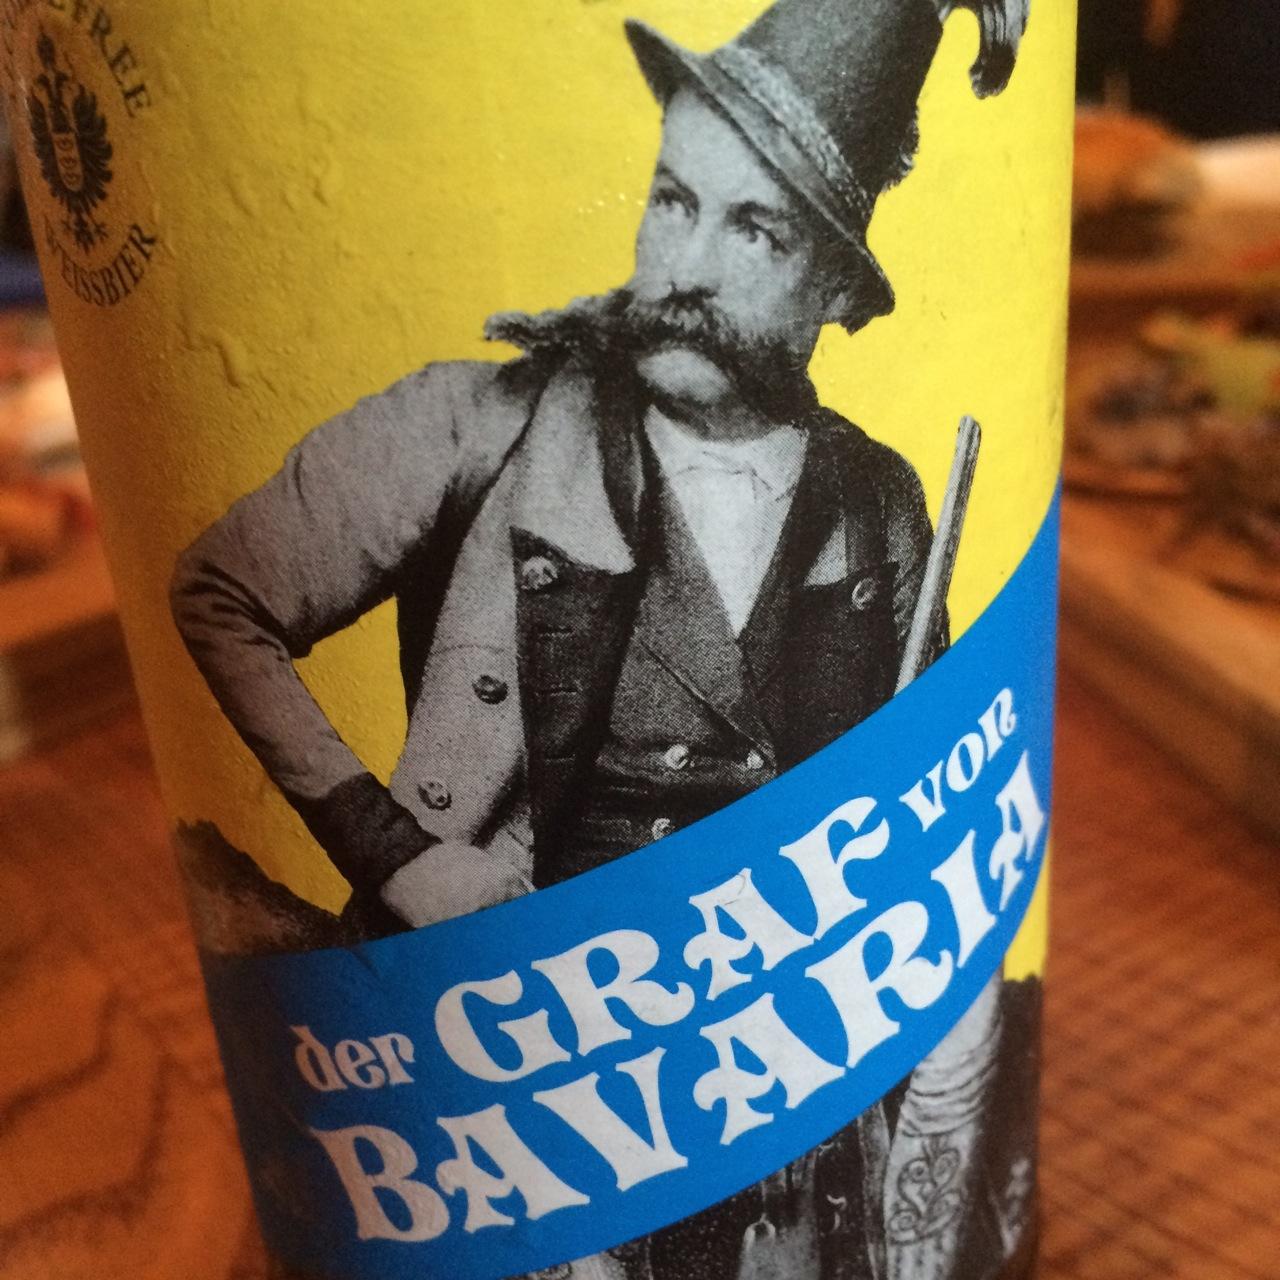 http://i1.wp.com/fatgayvegan.com/wp-content/uploads/2015/07/alcohol-free-beer-and-union.jpg?fit=1280%2C1280